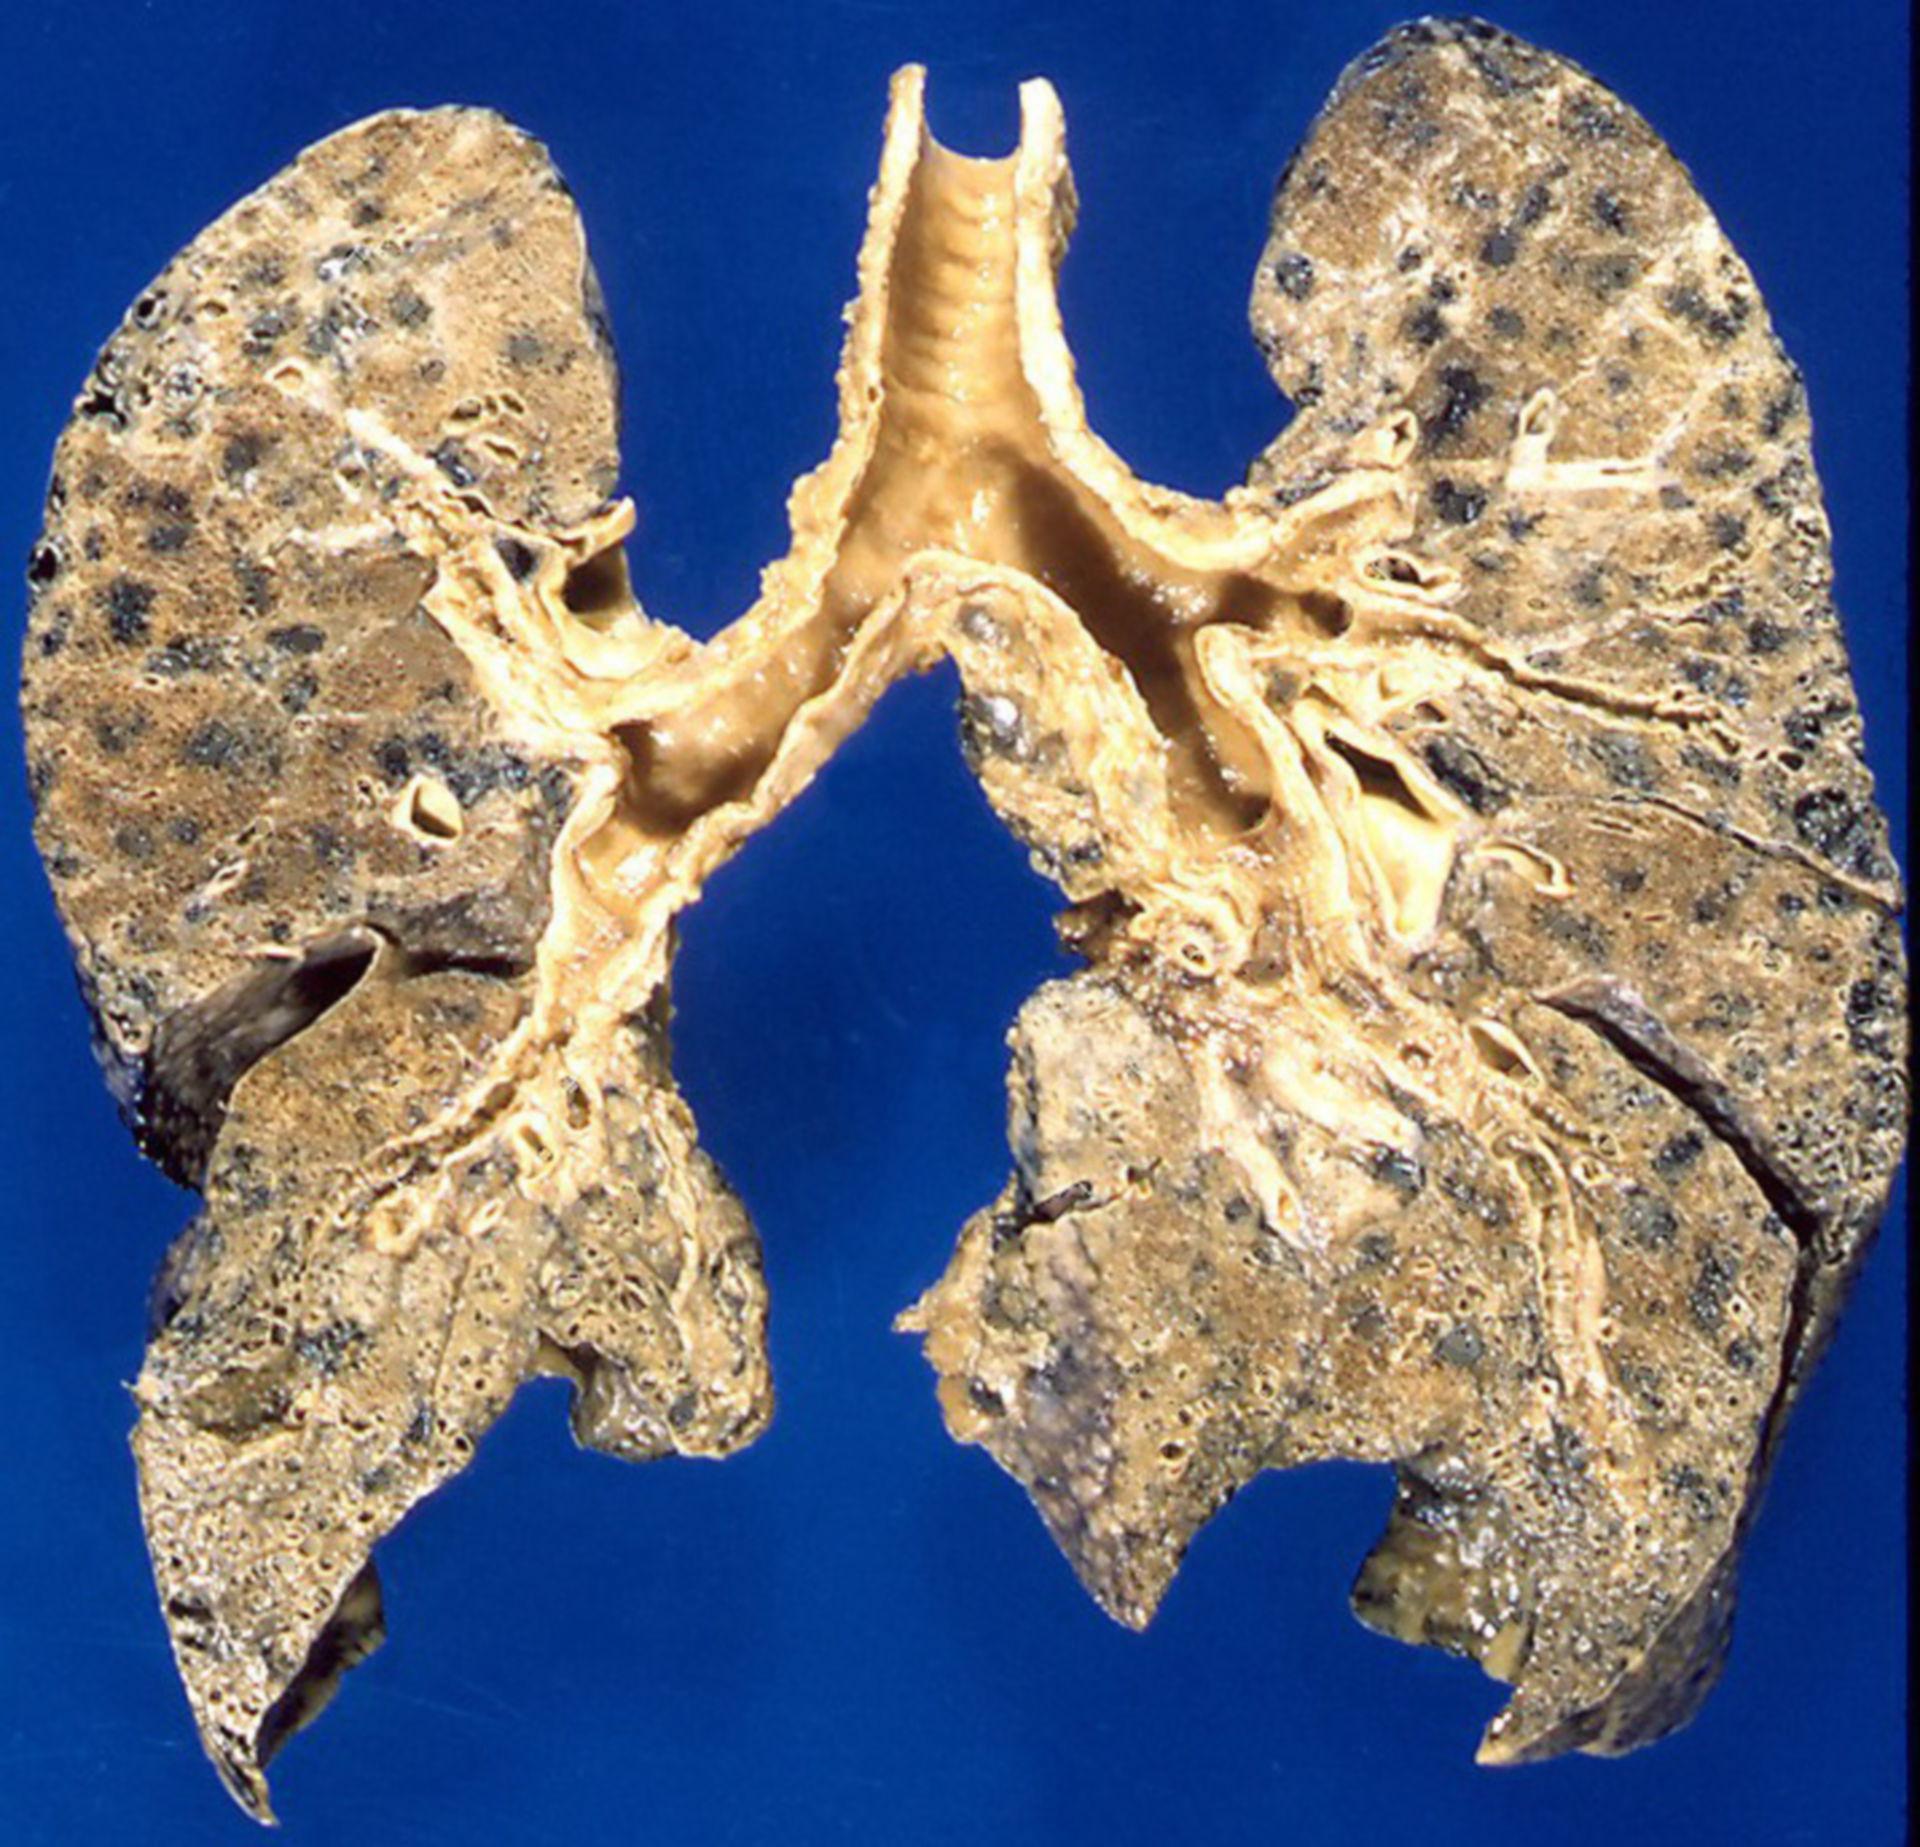 Zentrilobuläres Emphysem (Präparat)